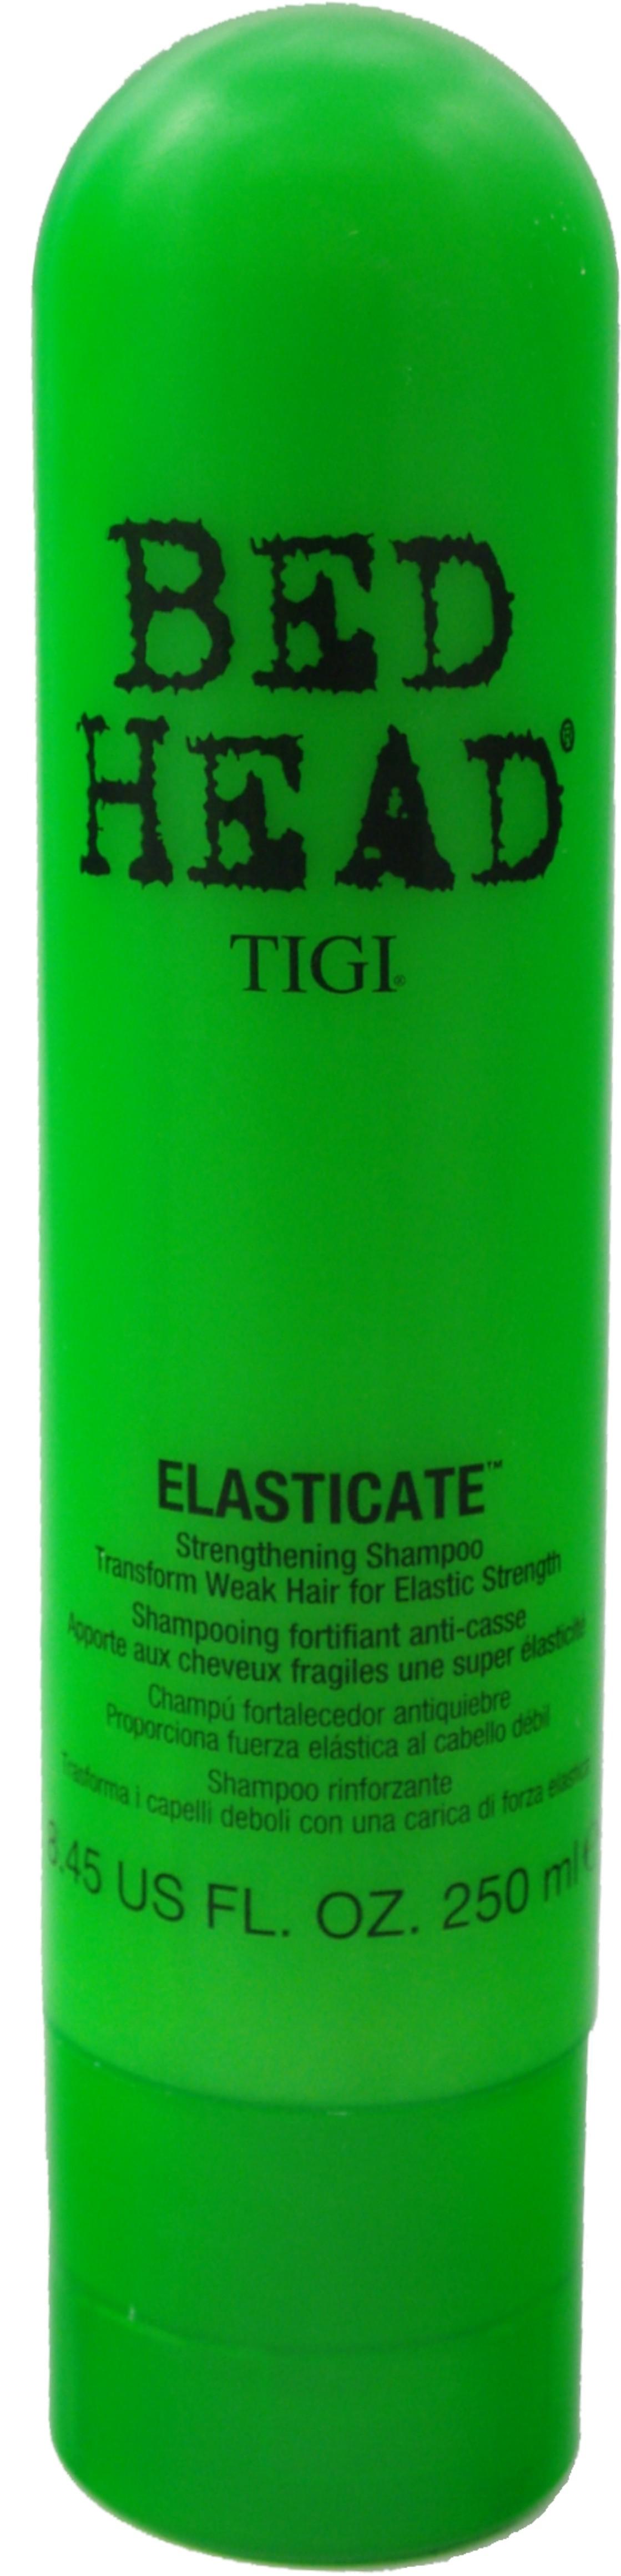 TIGI Bed Head ELASTICATE Strengthening Shampoo 250 ml